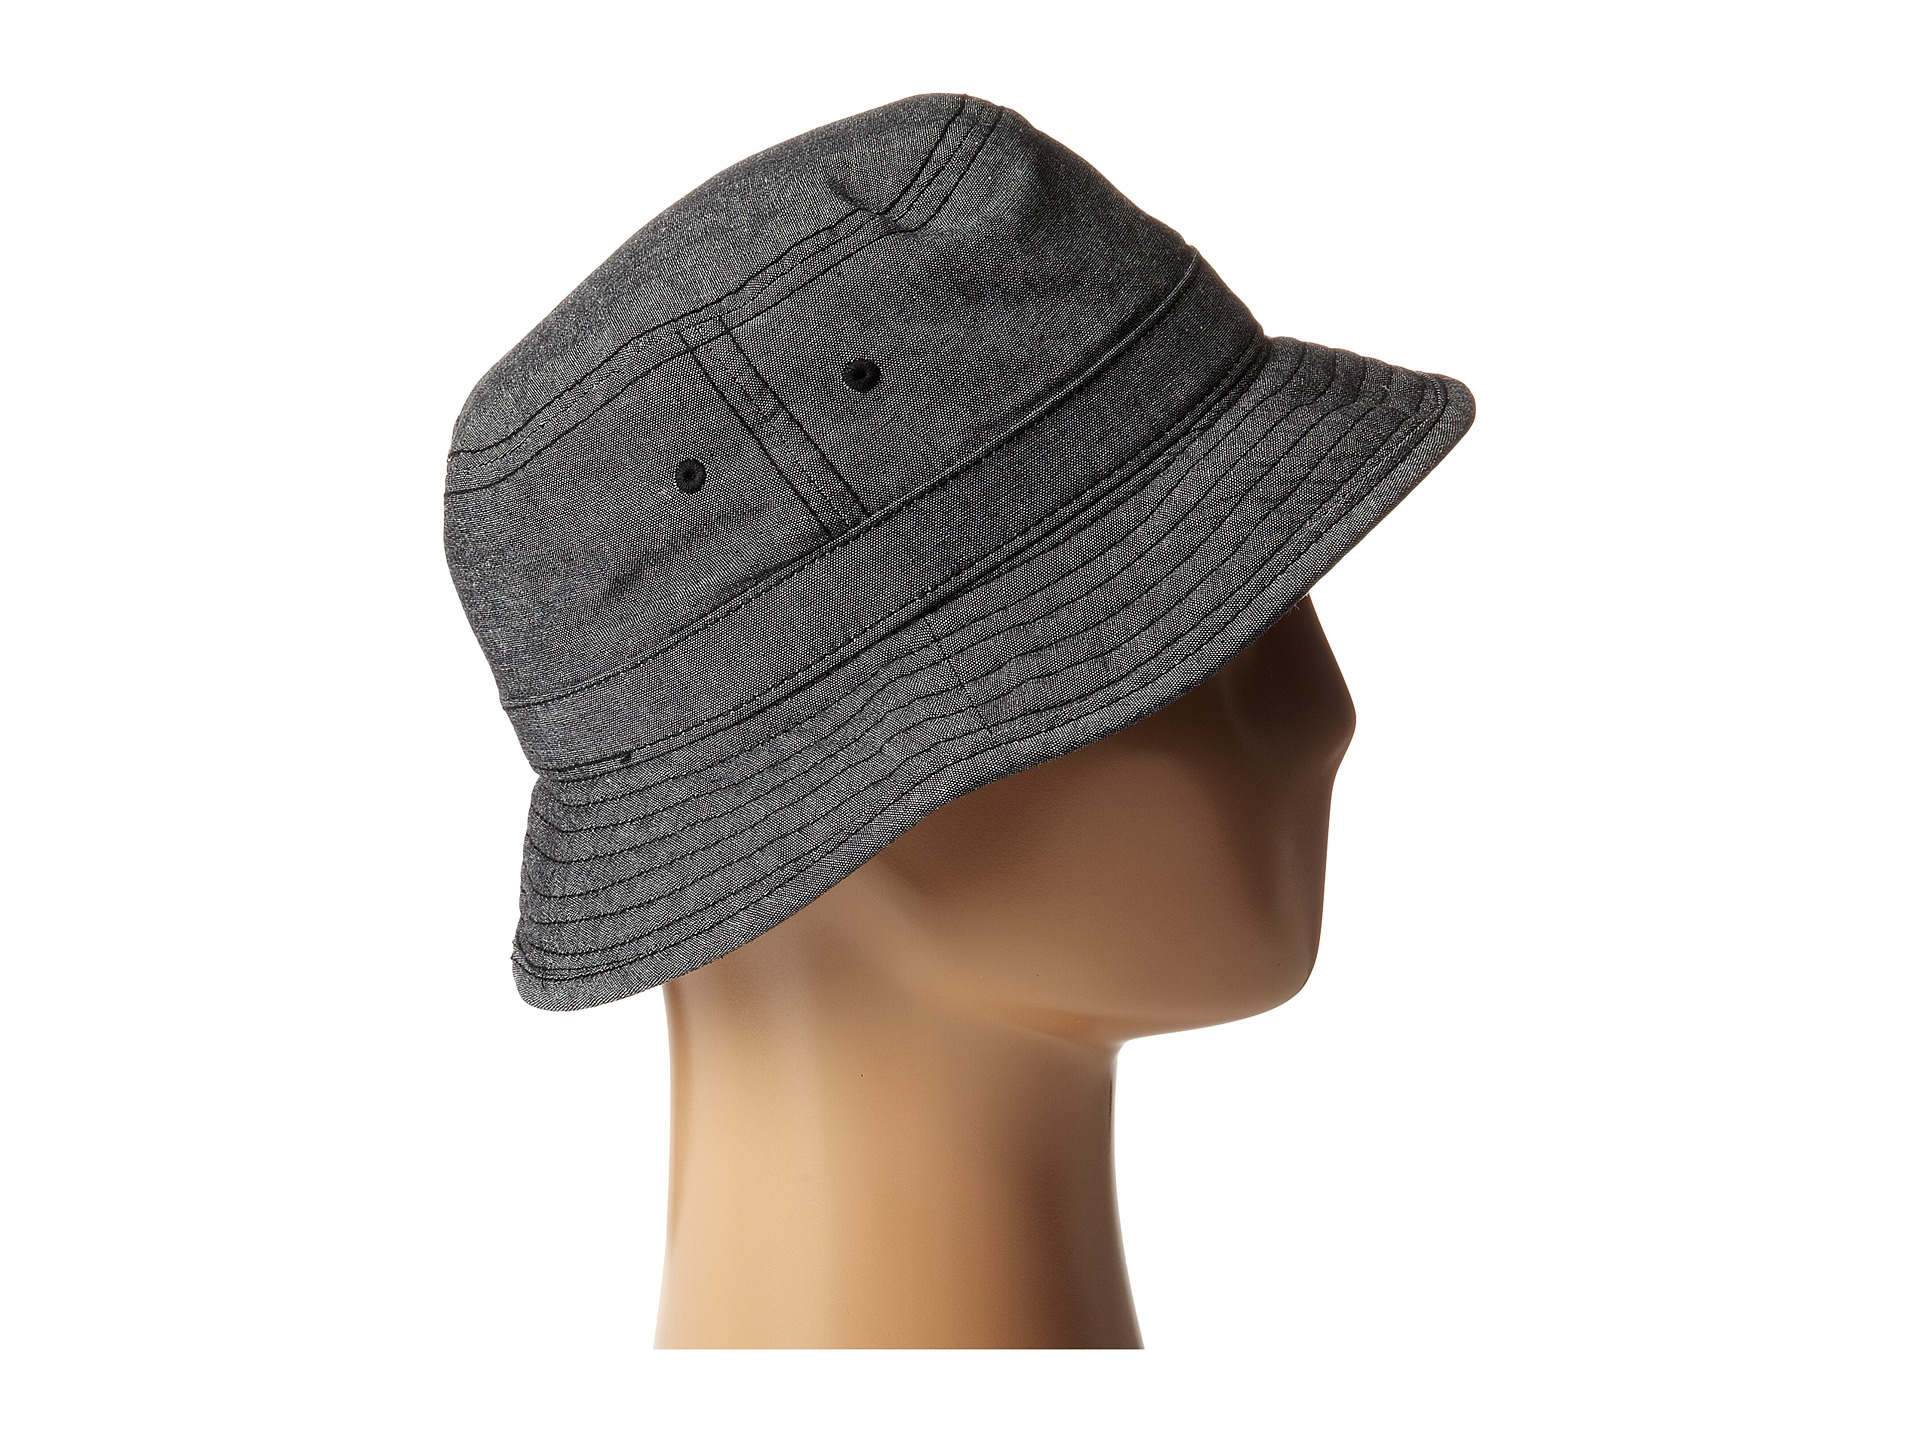 ad643f20b2dffd Original Penguin Evans Bucket Hat in Gray - Lyst